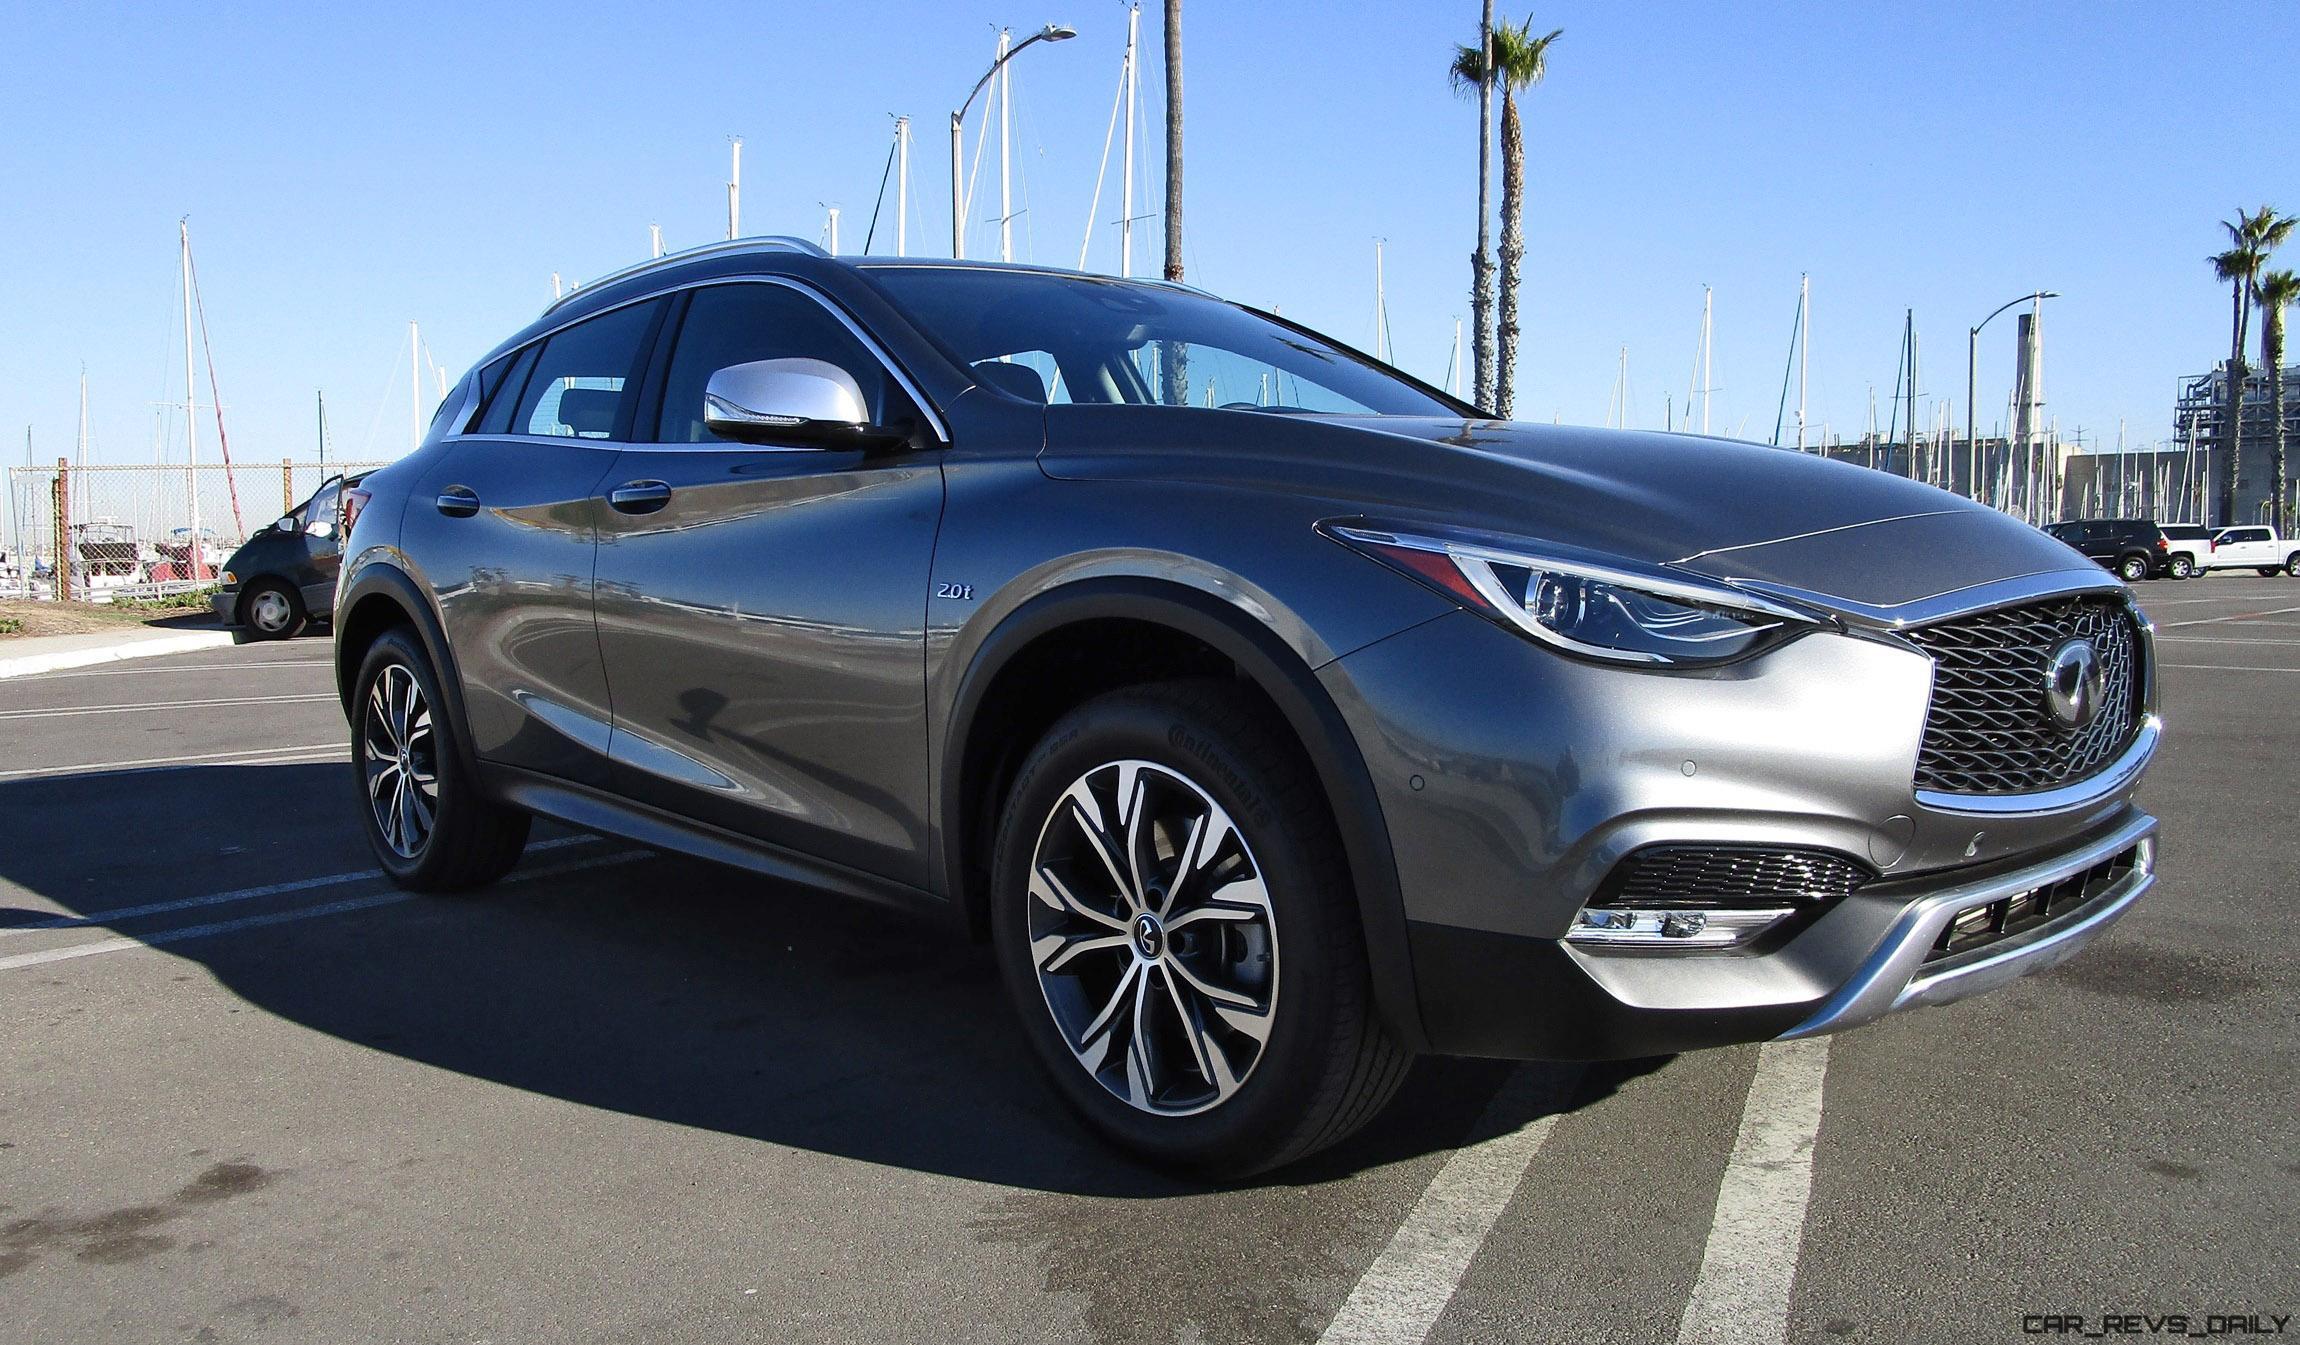 2017 infiniti qx30 premium awd road test review by ben lewis car revs. Black Bedroom Furniture Sets. Home Design Ideas